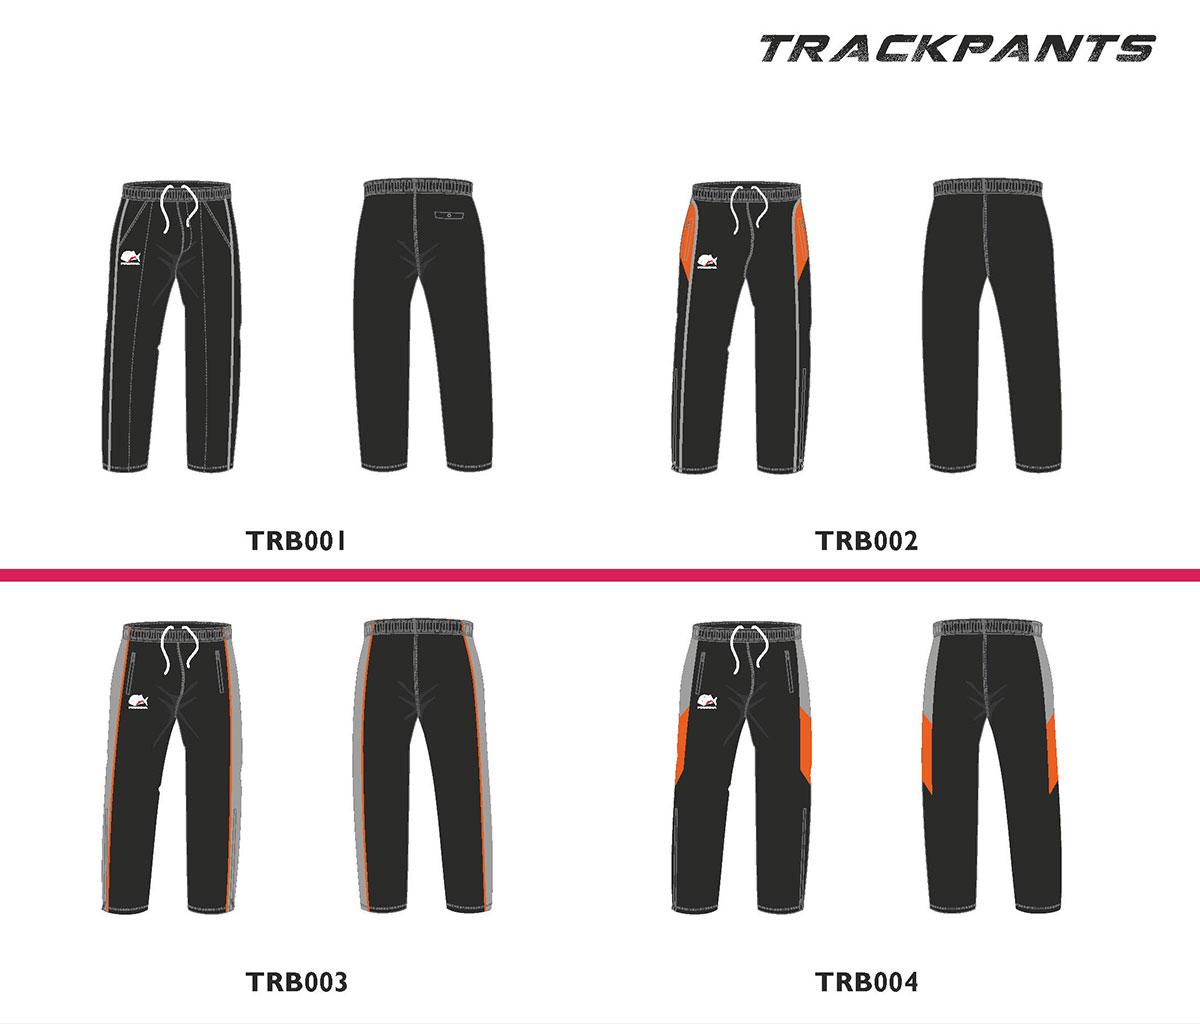 Piranha Trackpants